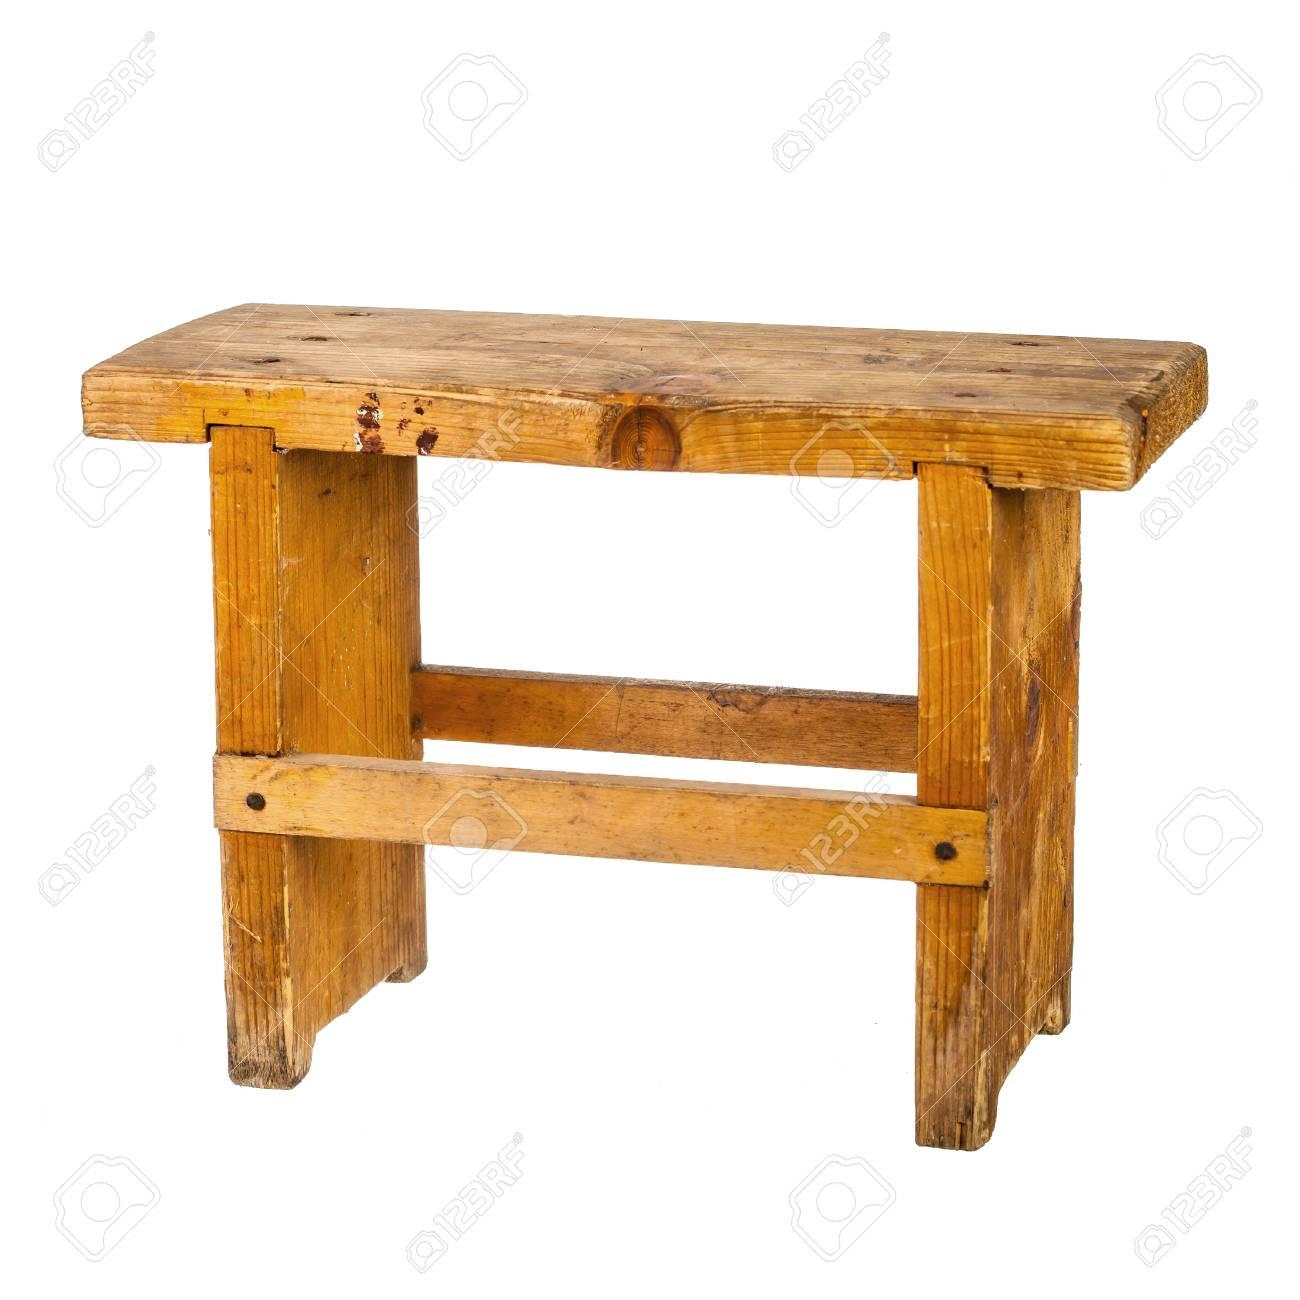 Pleasant Small Wooden Bench Isolated On White Short Links Chair Design For Home Short Linksinfo